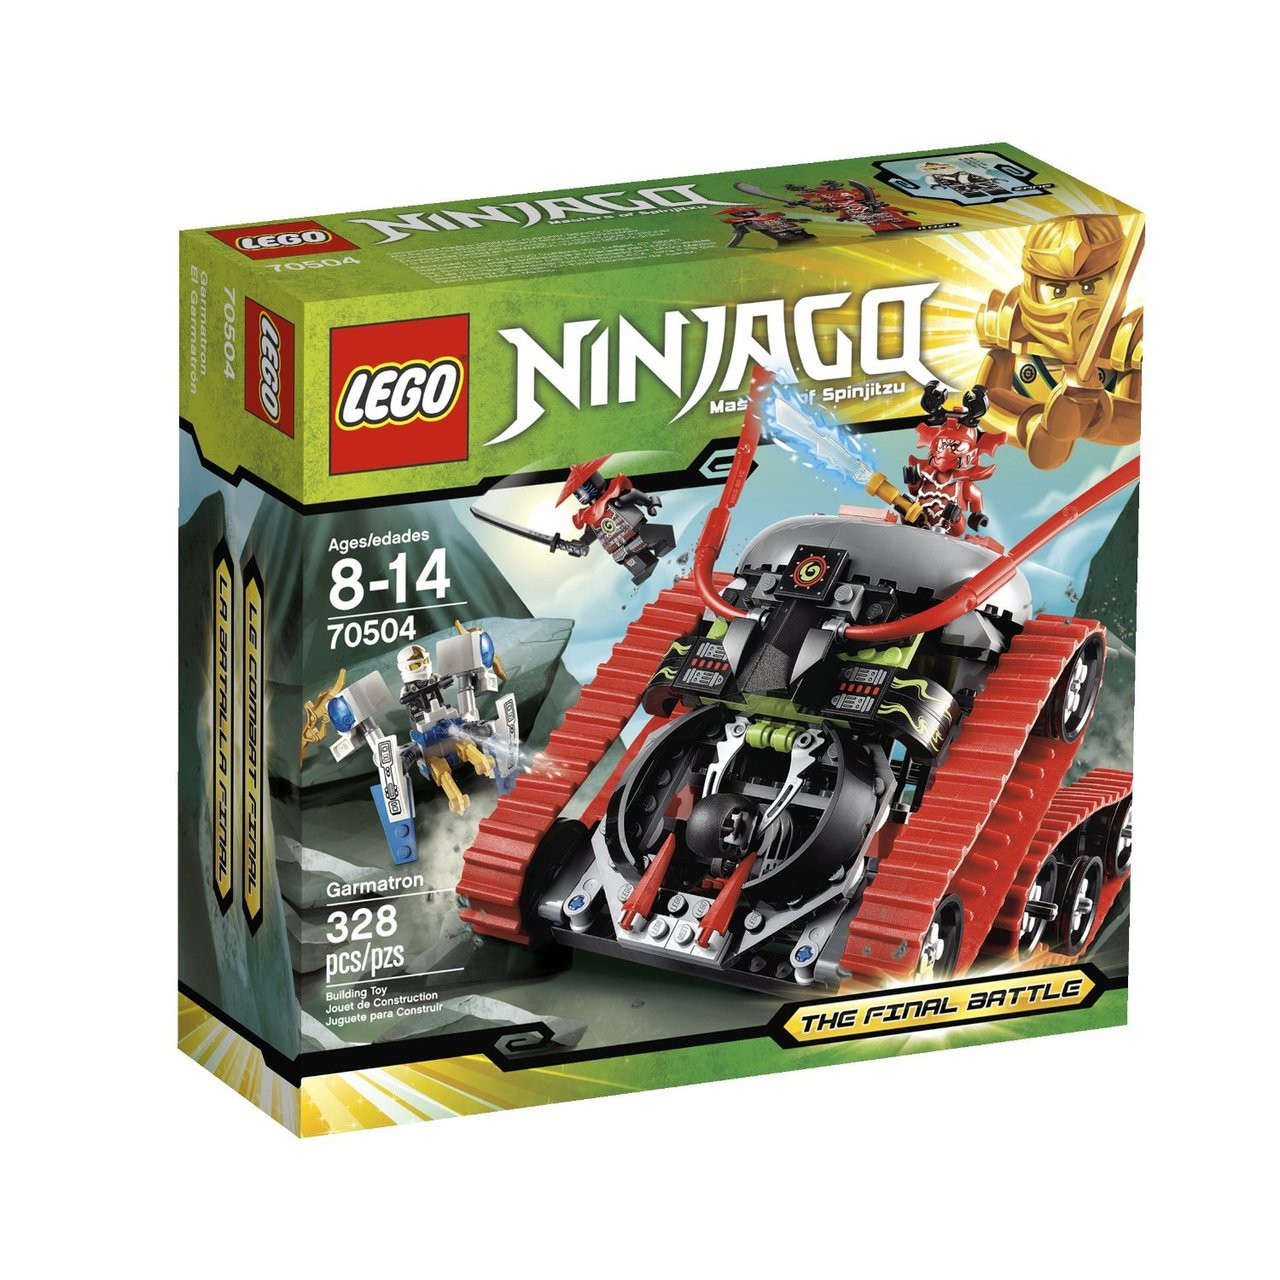 2 LEGO NINJAGO GARMATRON GENERAL KOZ /& Lord Garmadon MINIFIGURES  LOT new